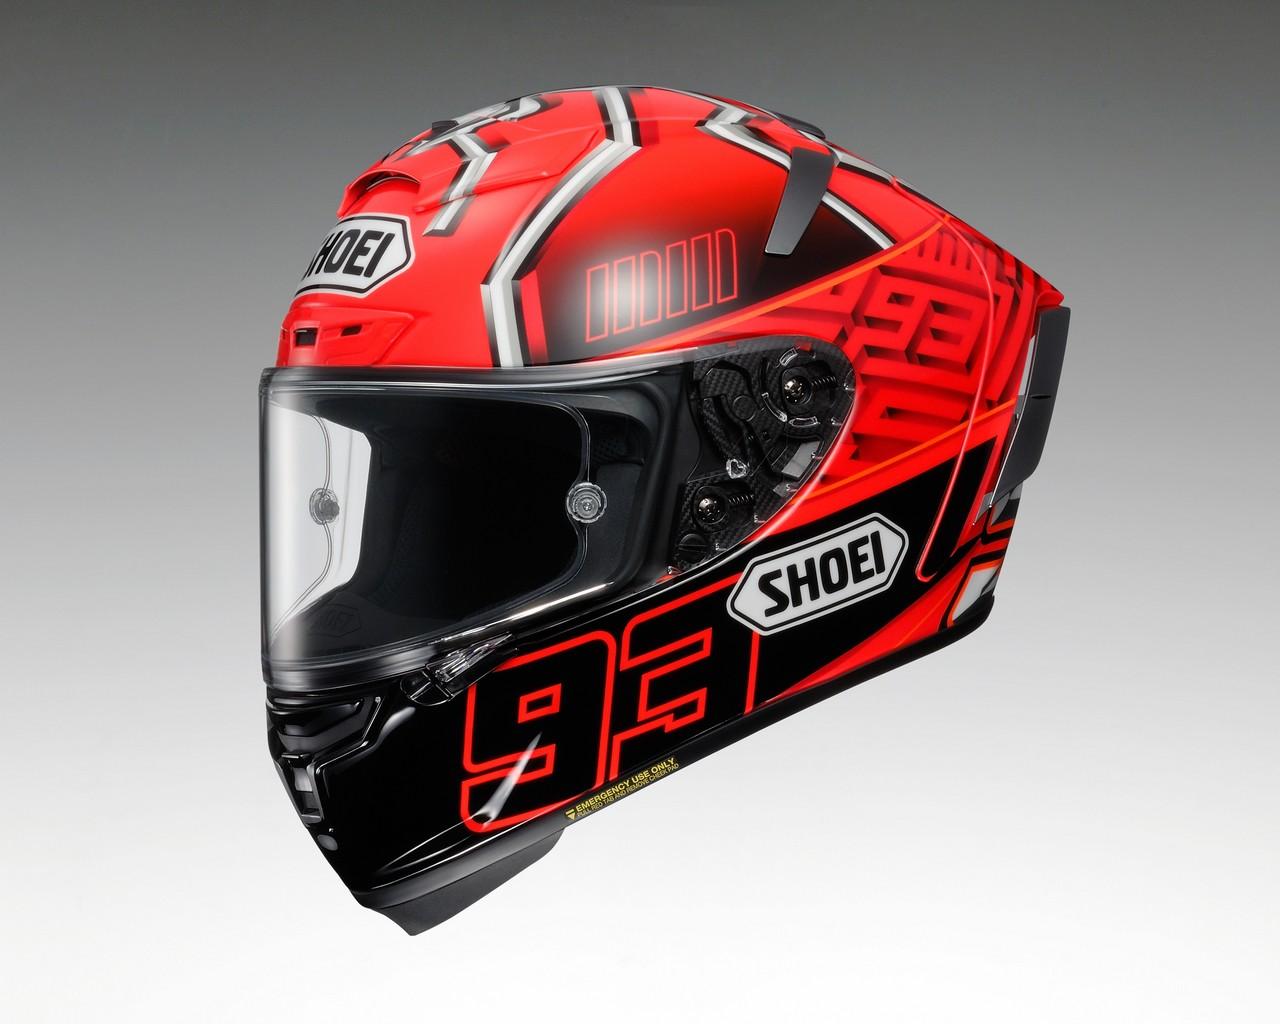 【SHOEI】X-14 ( X-FOURTEEN) 全罩安全帽 MARQUEZ 4 彩繪 - 「Webike-摩托百貨」